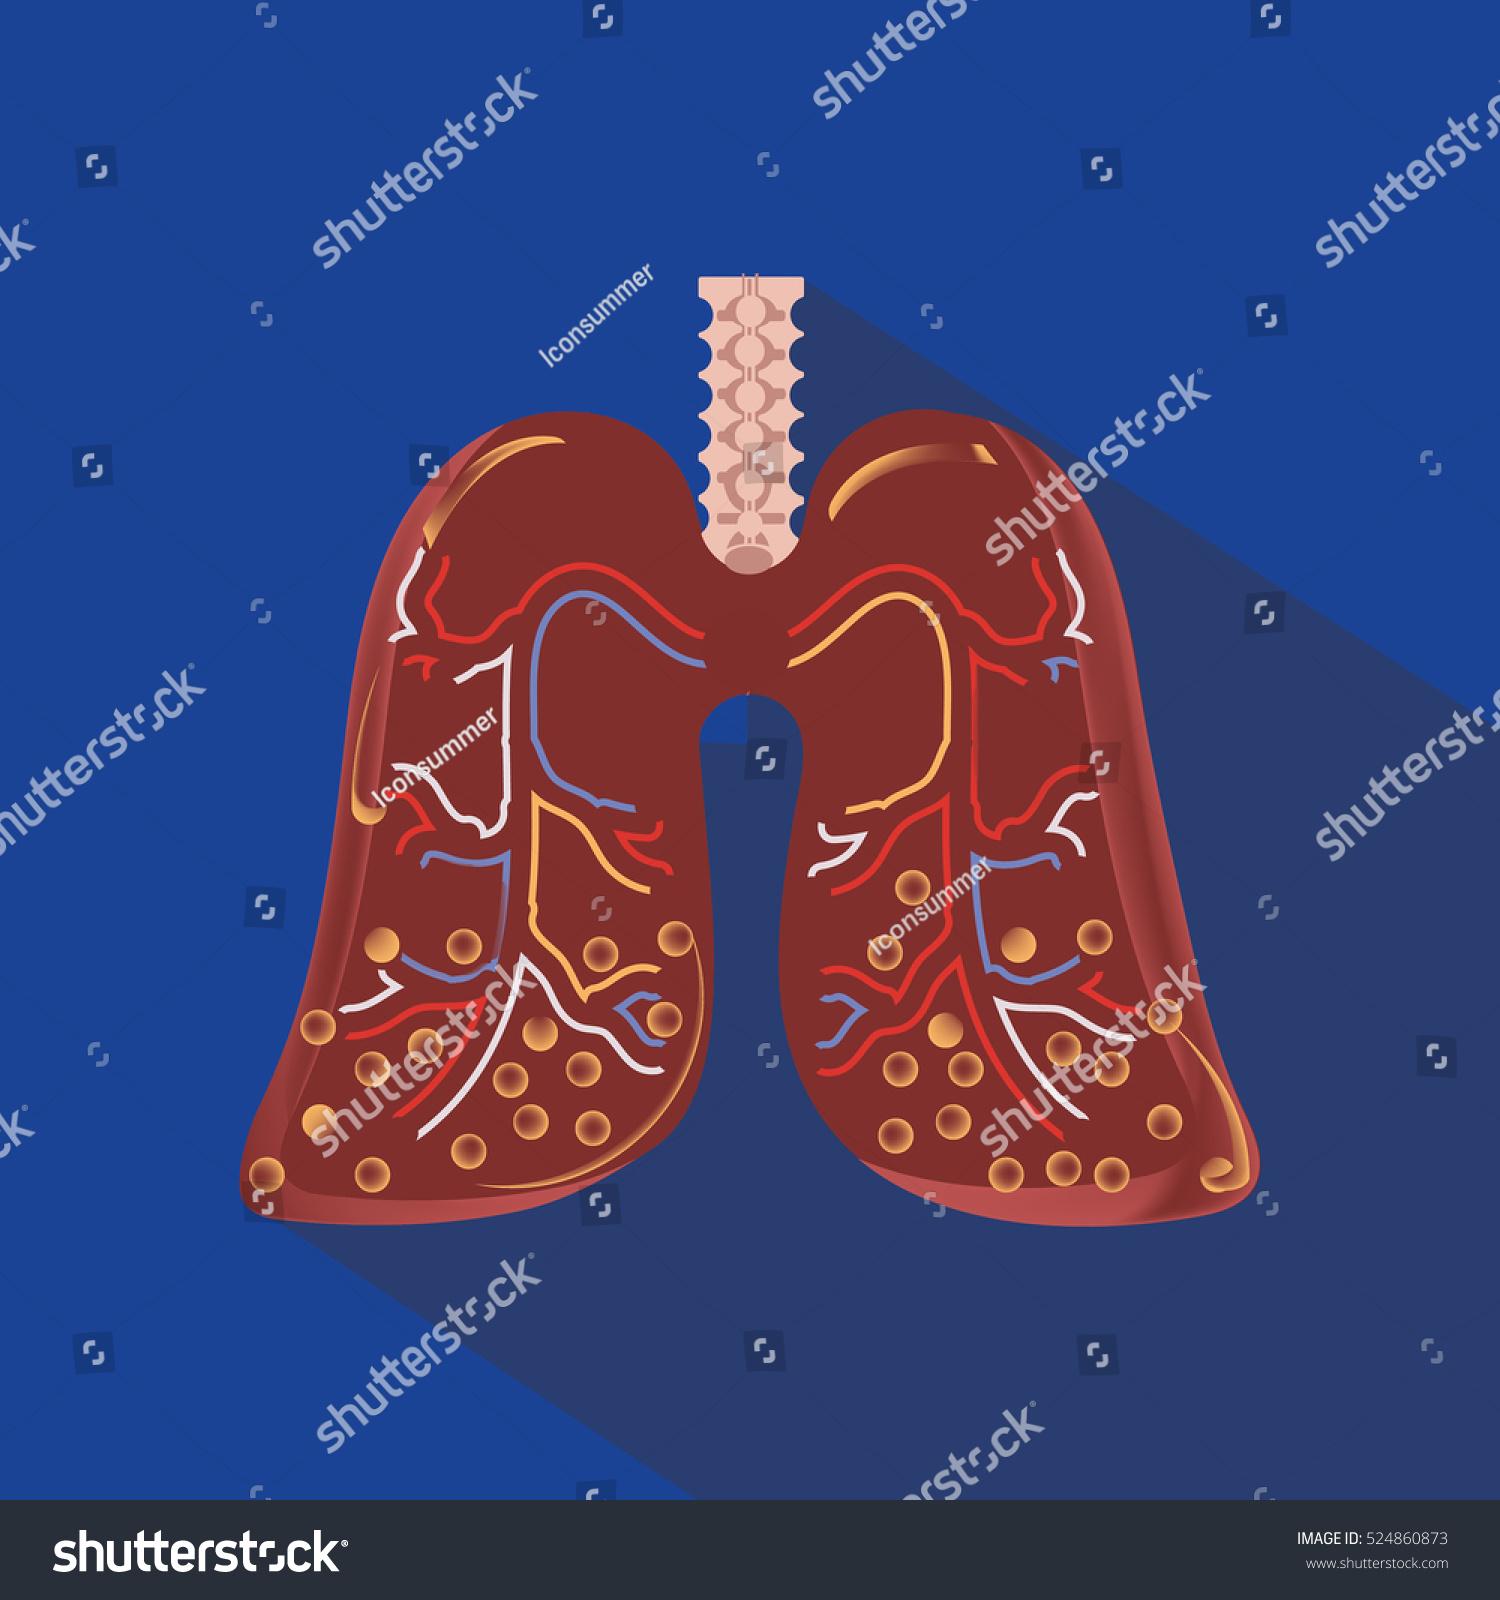 Human Lung Anatomy Diagram Stock Vector 524860873 Shutterstock